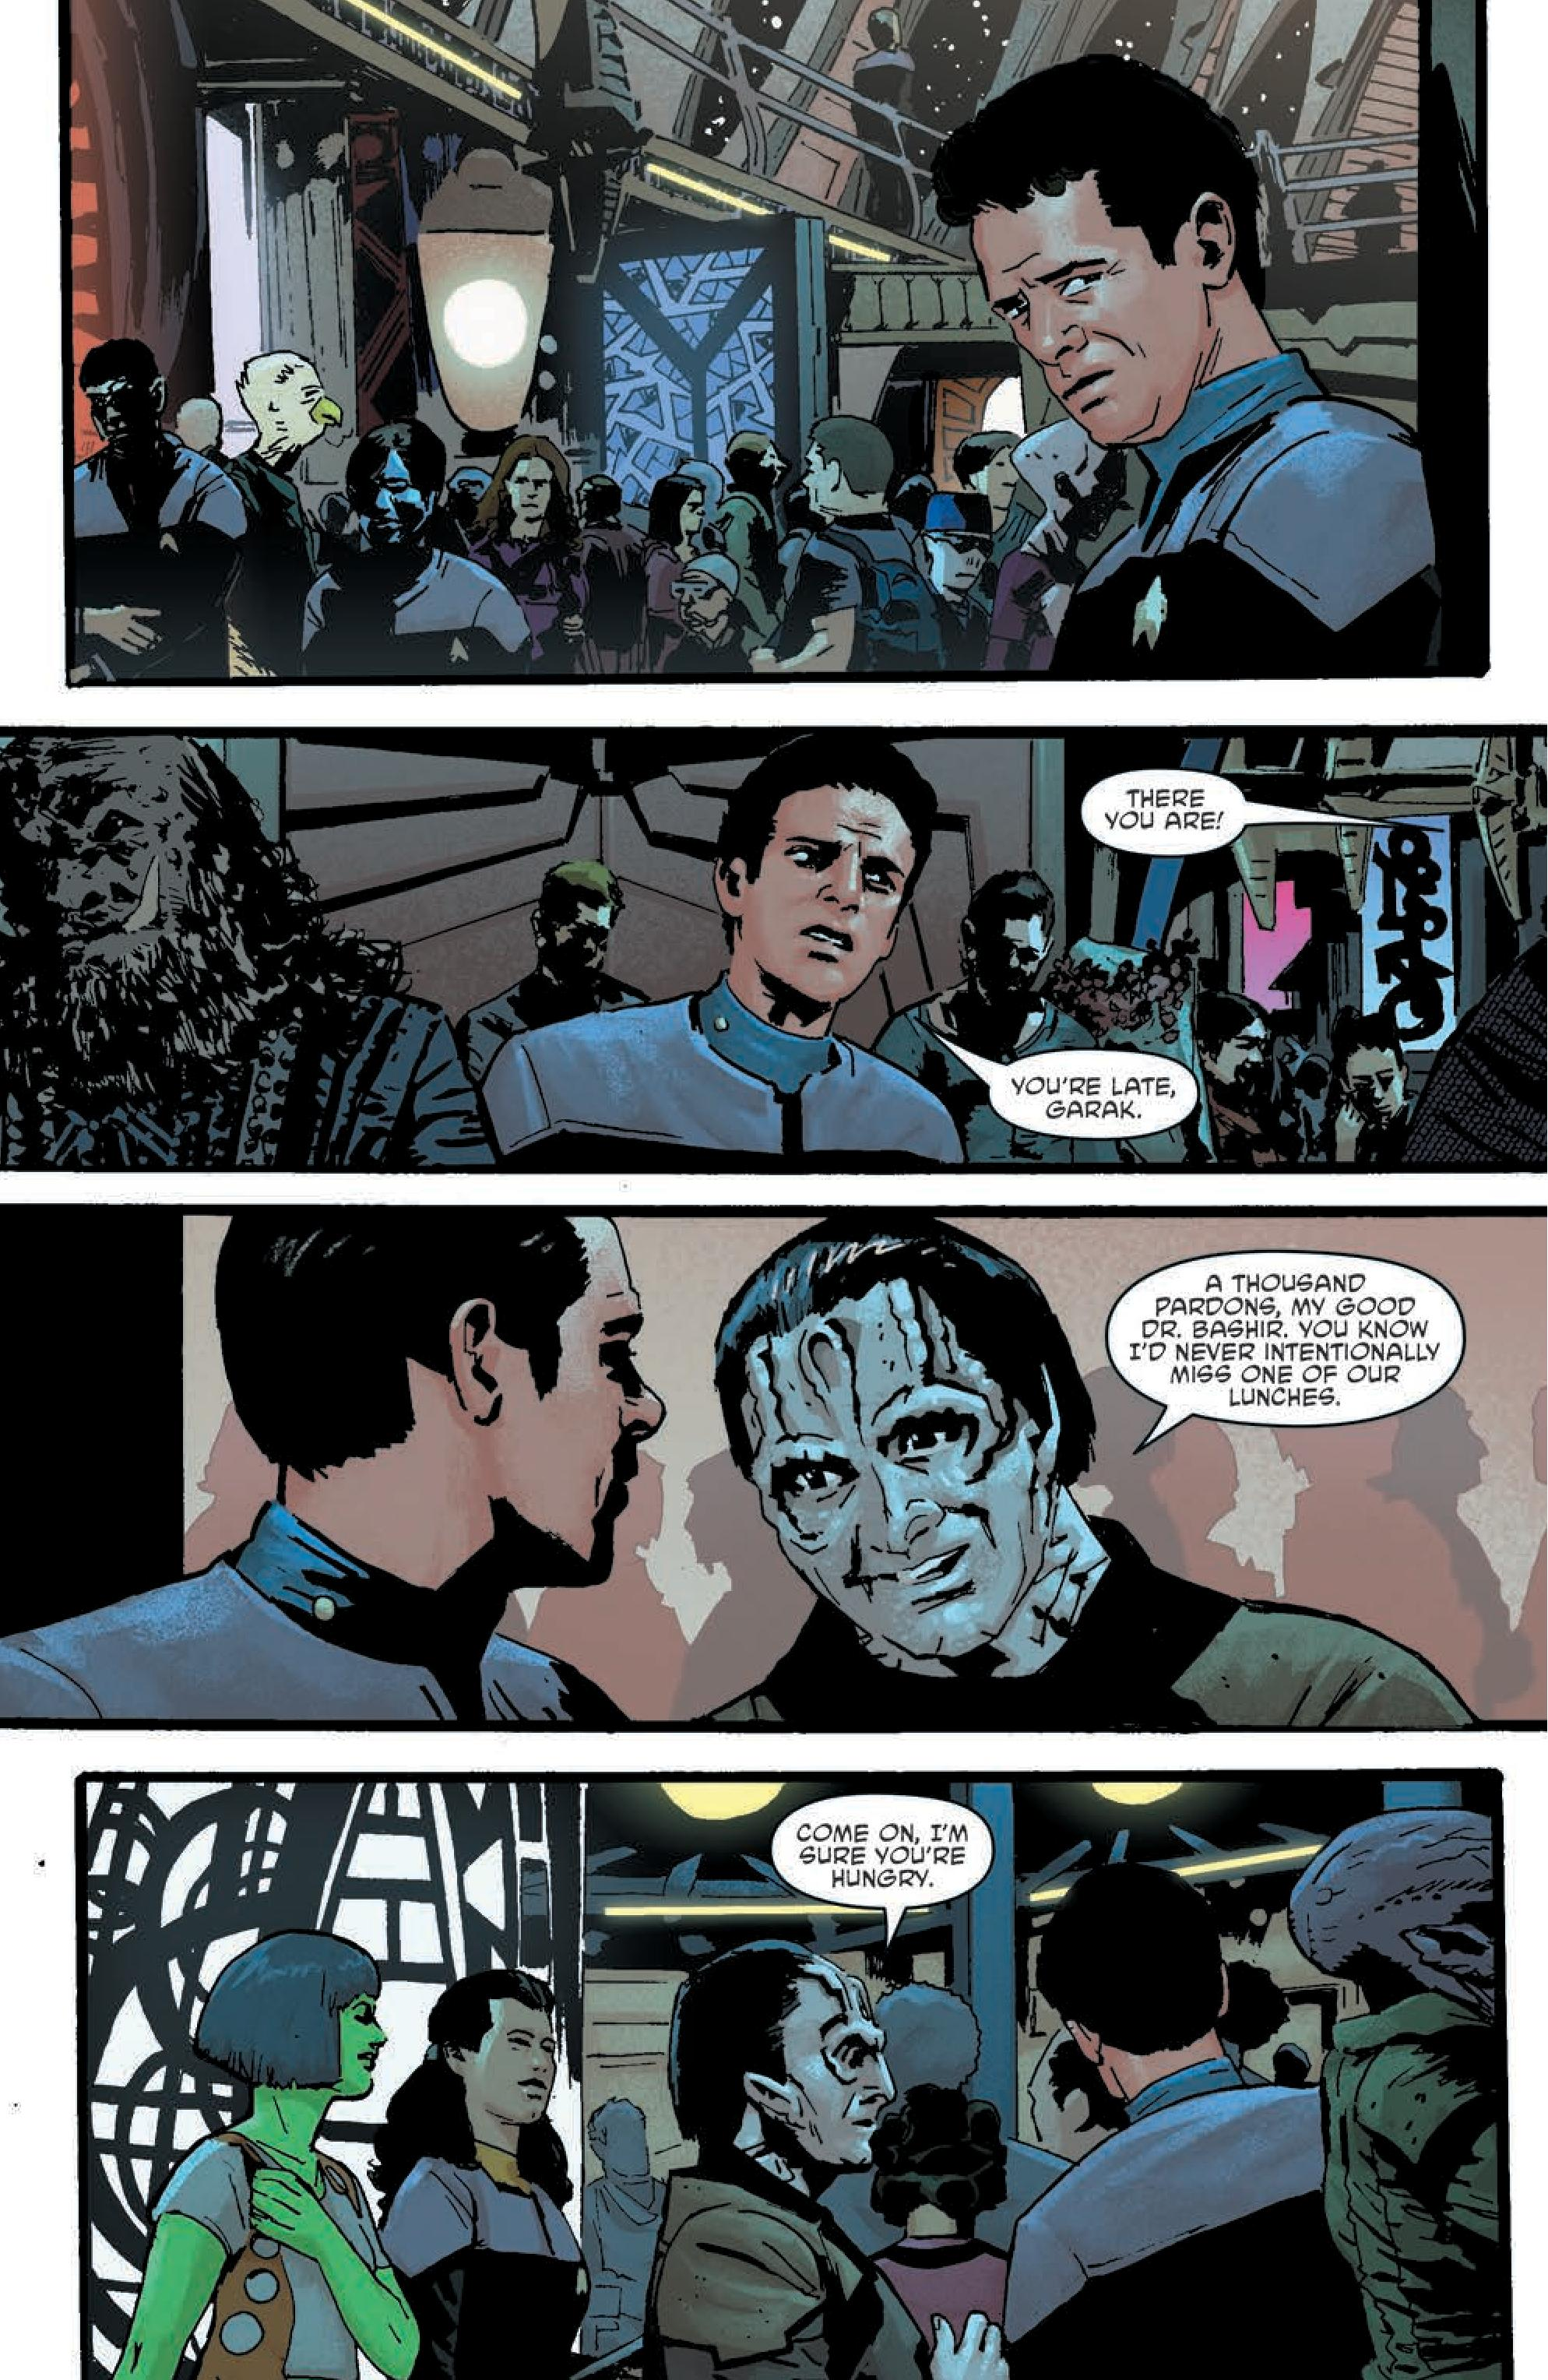 ST_DS9_01-pr-page-003